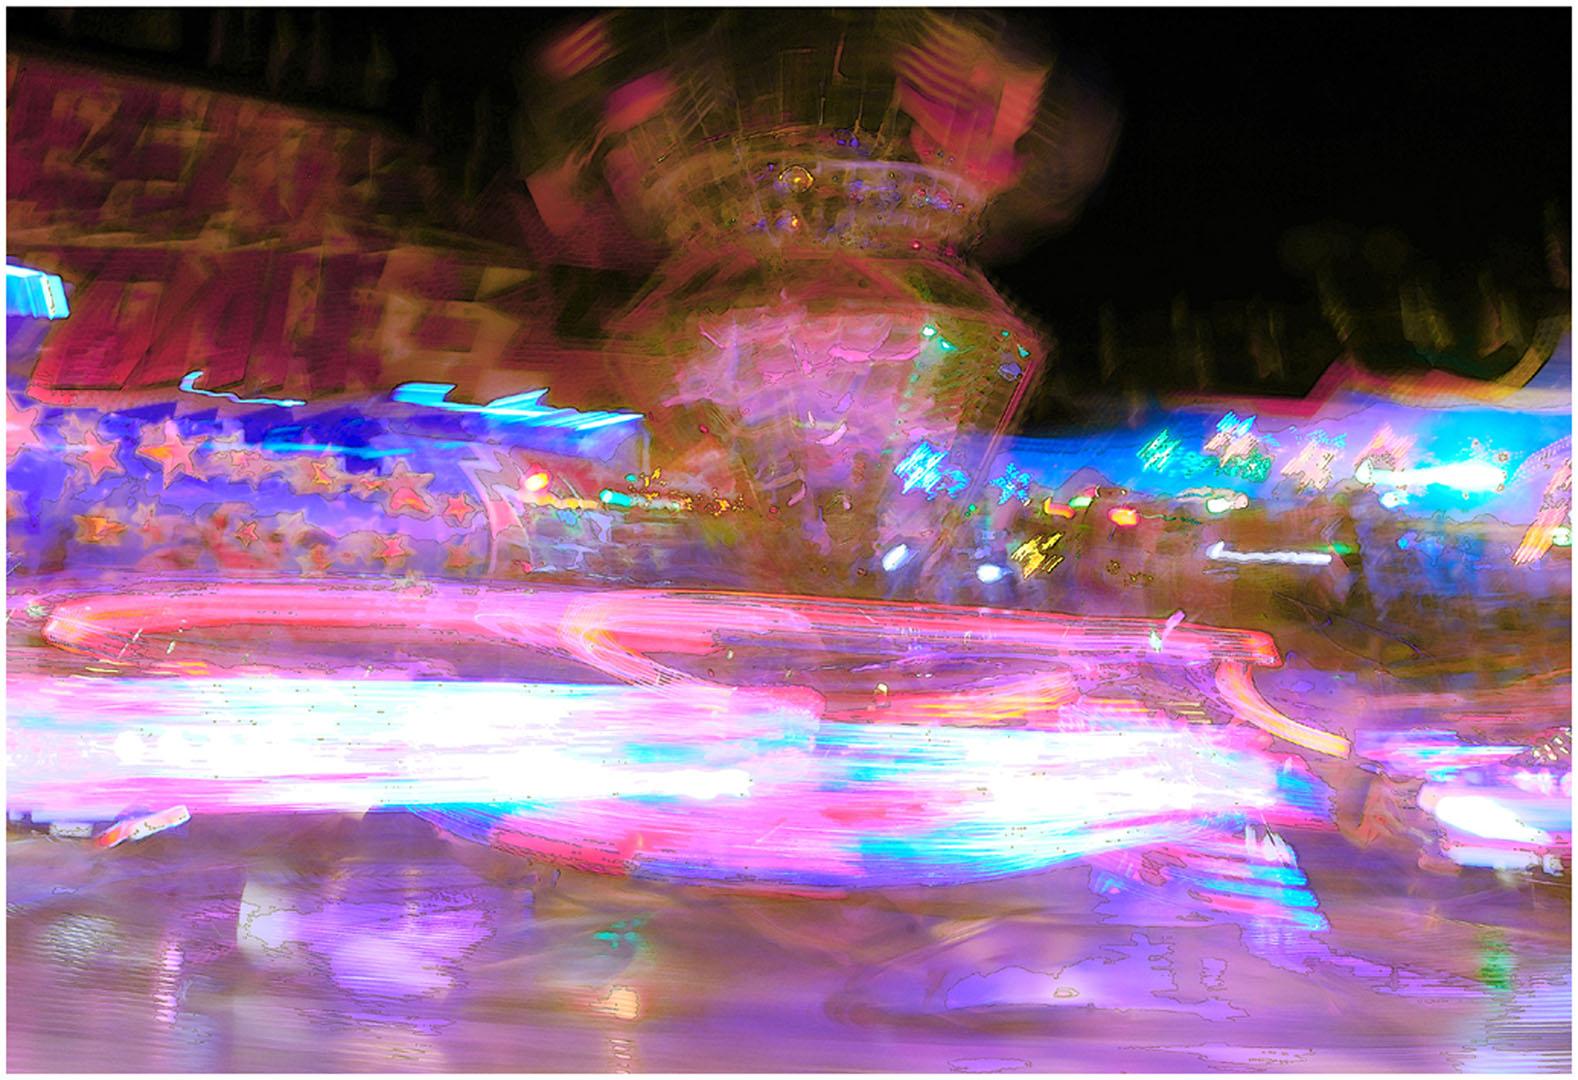 Light_Paintings_057_AXYC24